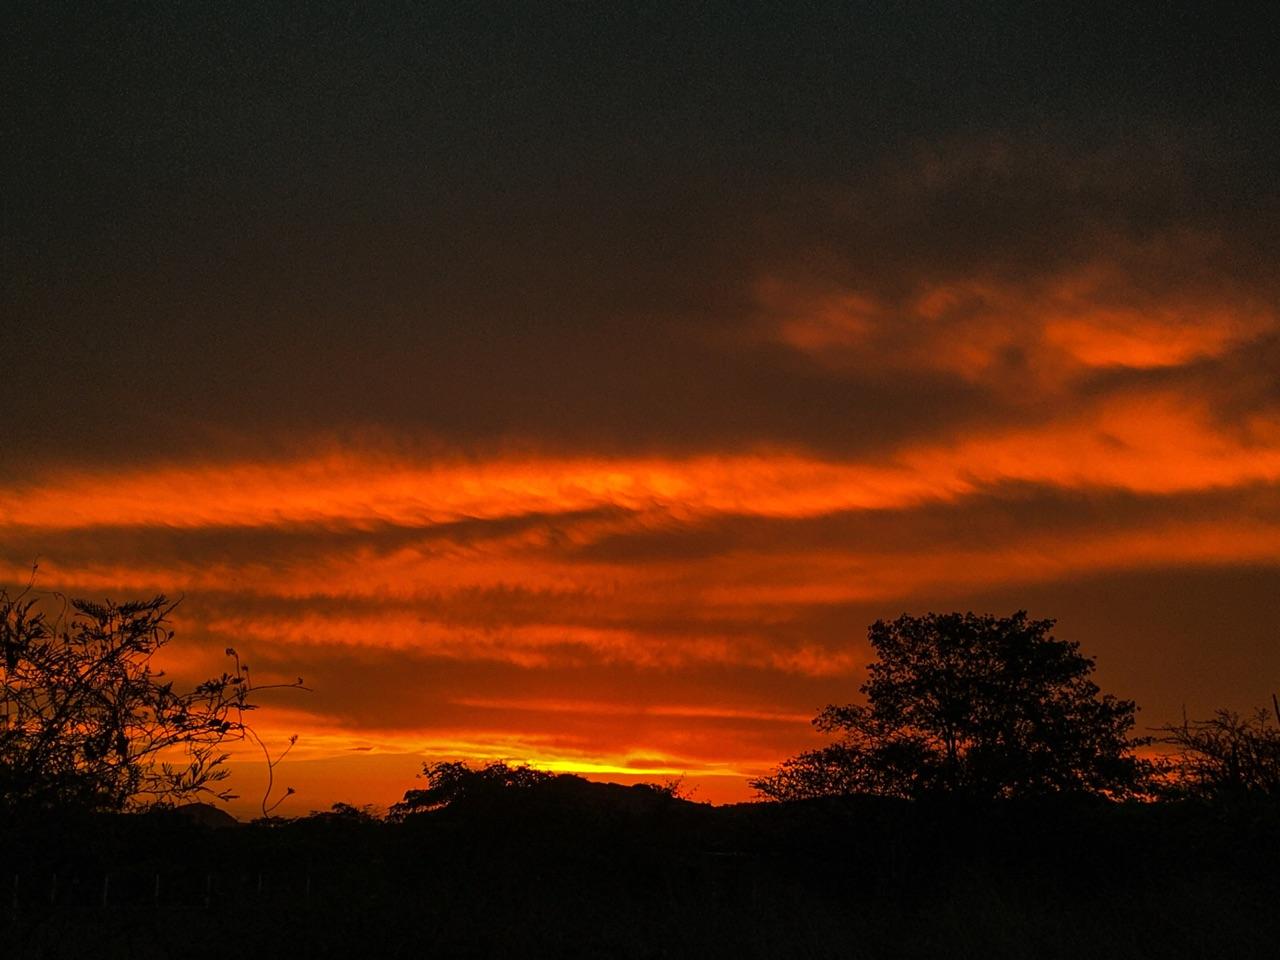 inspiration, photography, and sunset image